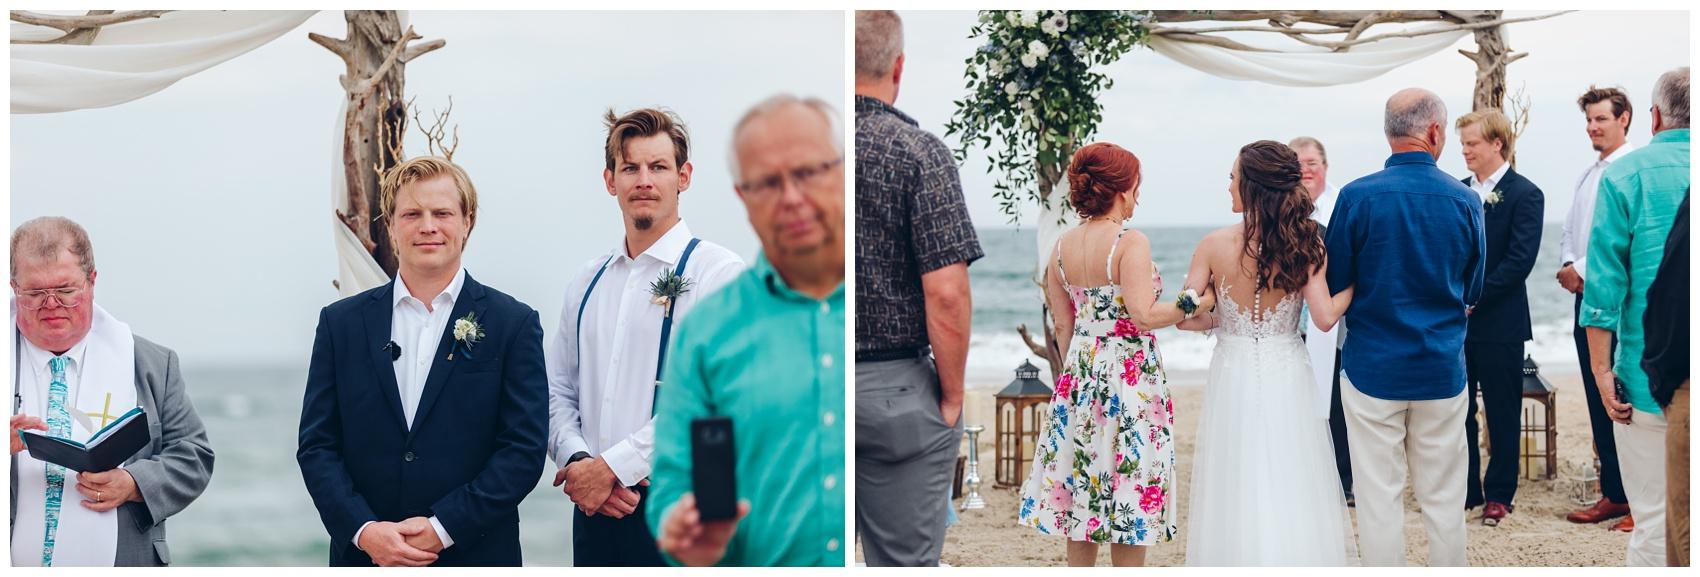 Outer-Banks-Corolla-Wedding_0060.jpg